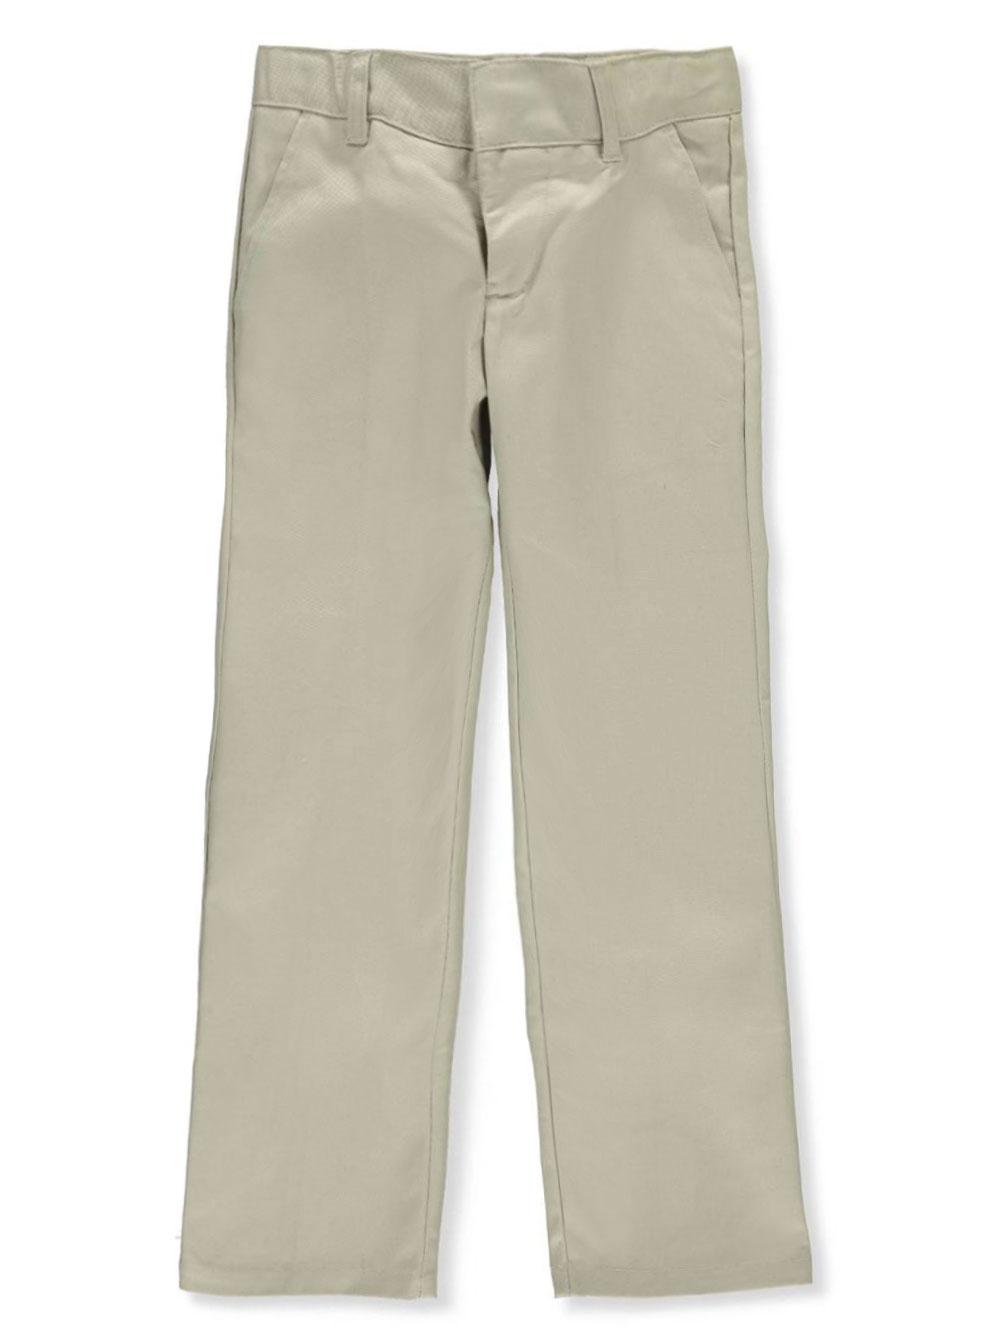 French Toast School Uniform Big Boys' Flat Front Wrinkle No More Double Knee Pants (Sizes 8 - 20) - khaki, 8